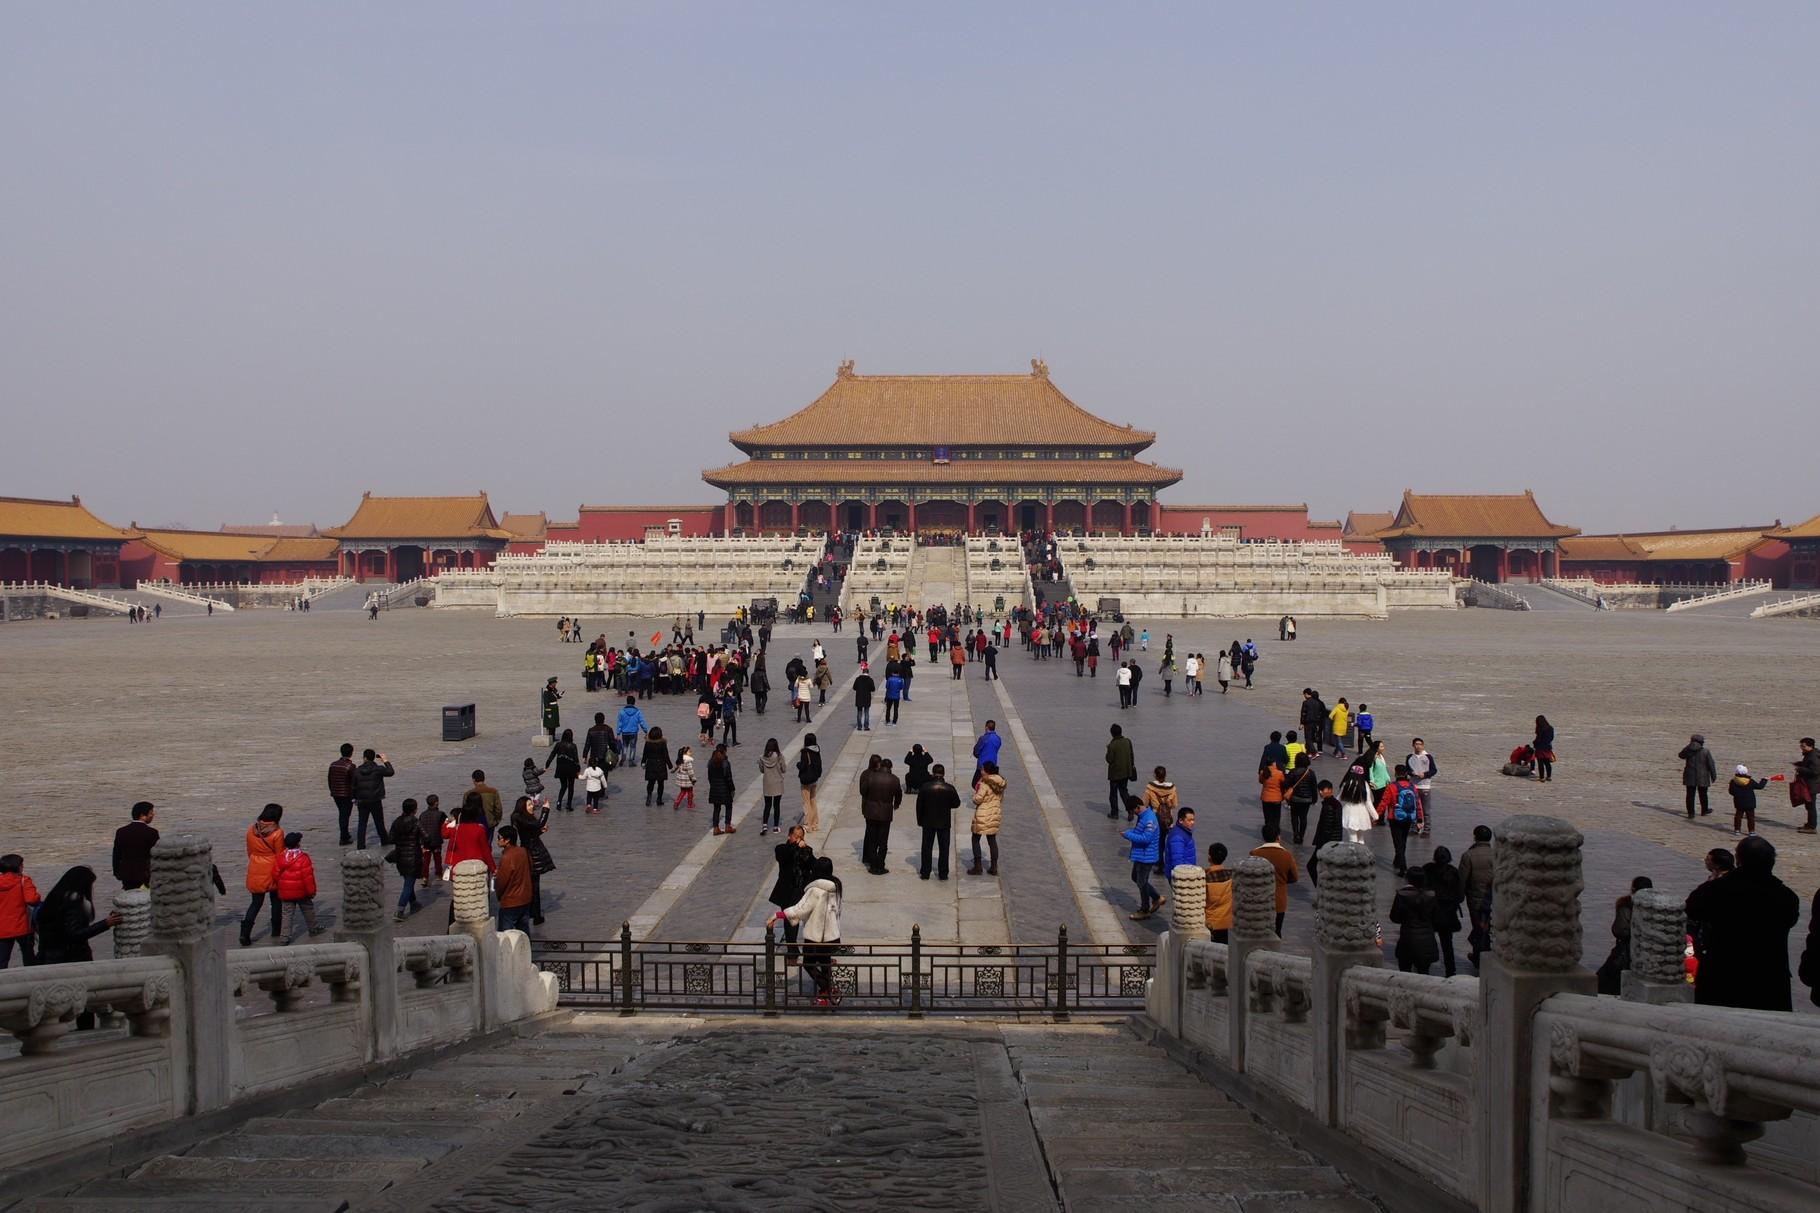 太和殿 紫禁城の中心